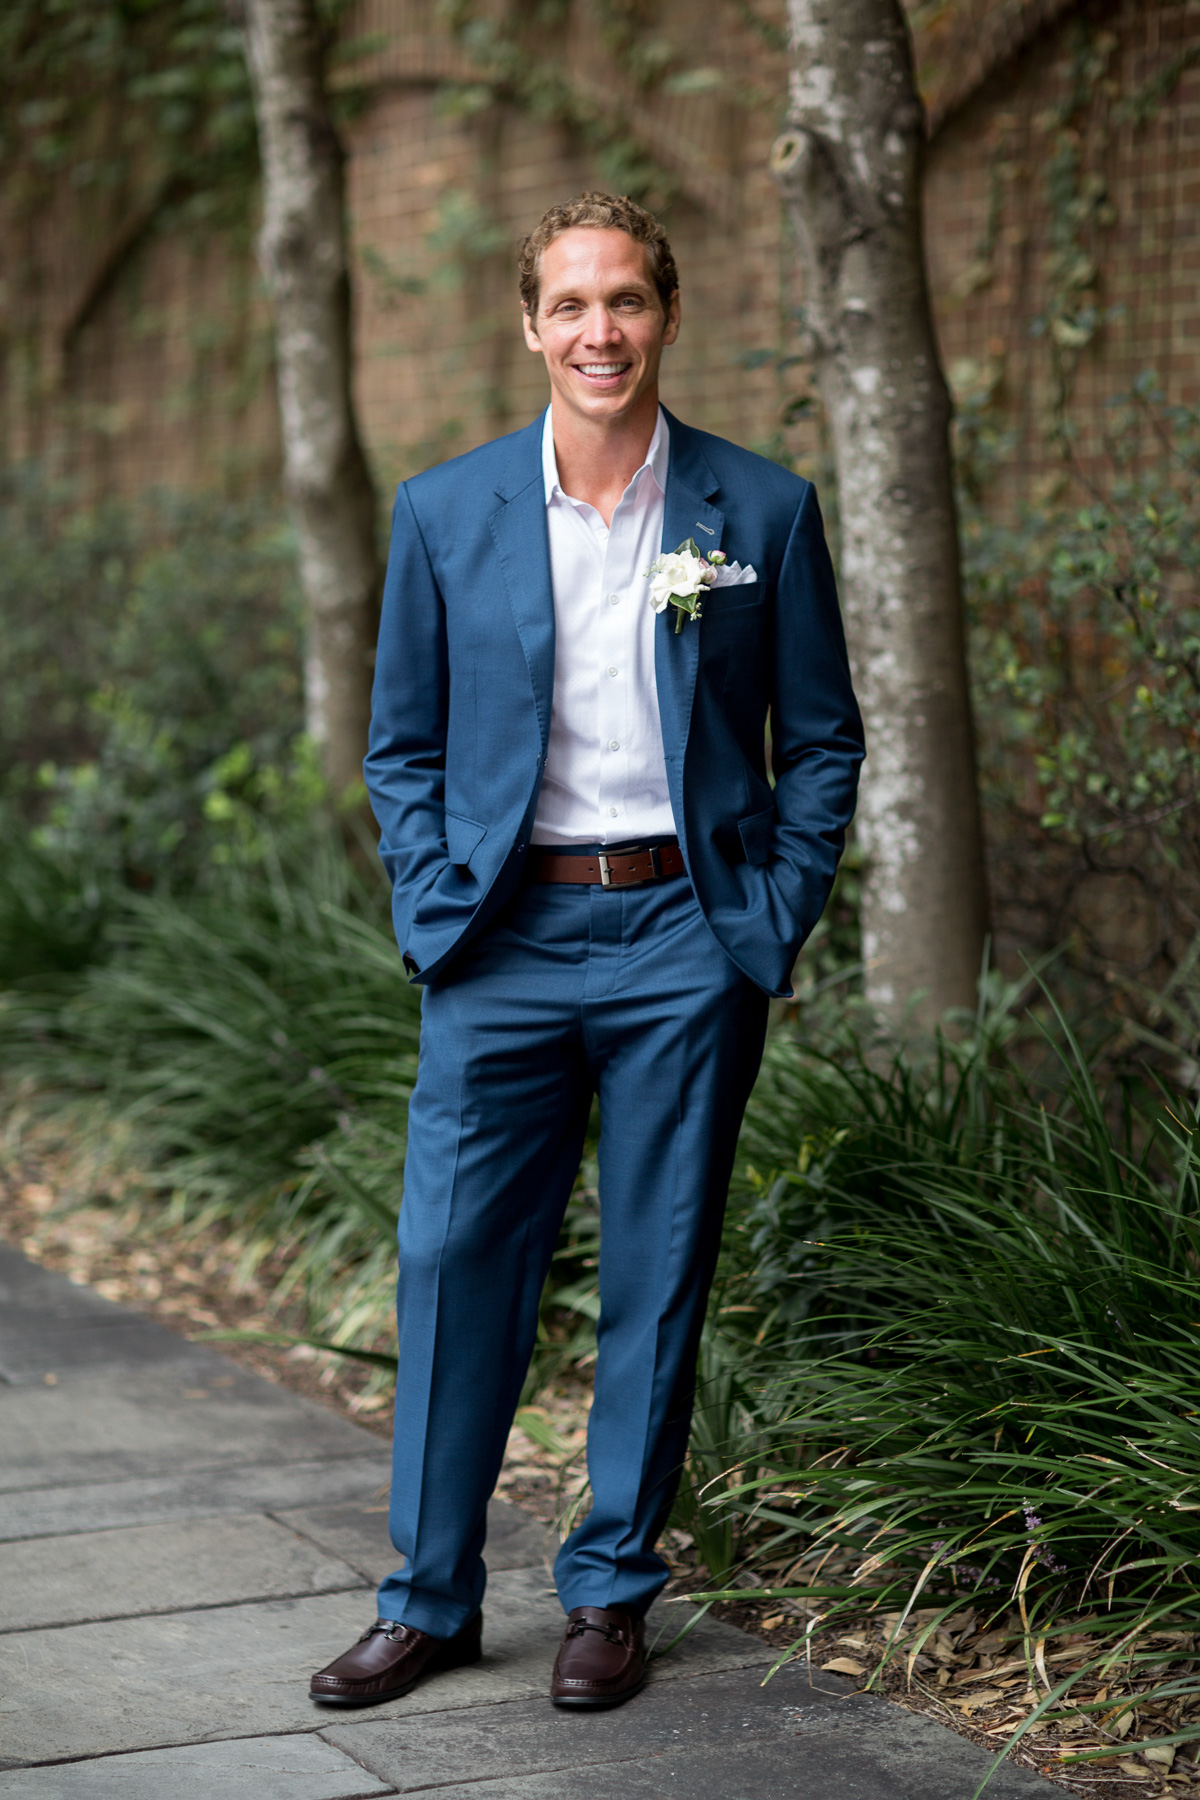 Charleston-best-wedding-photographer-SC-07.jpg